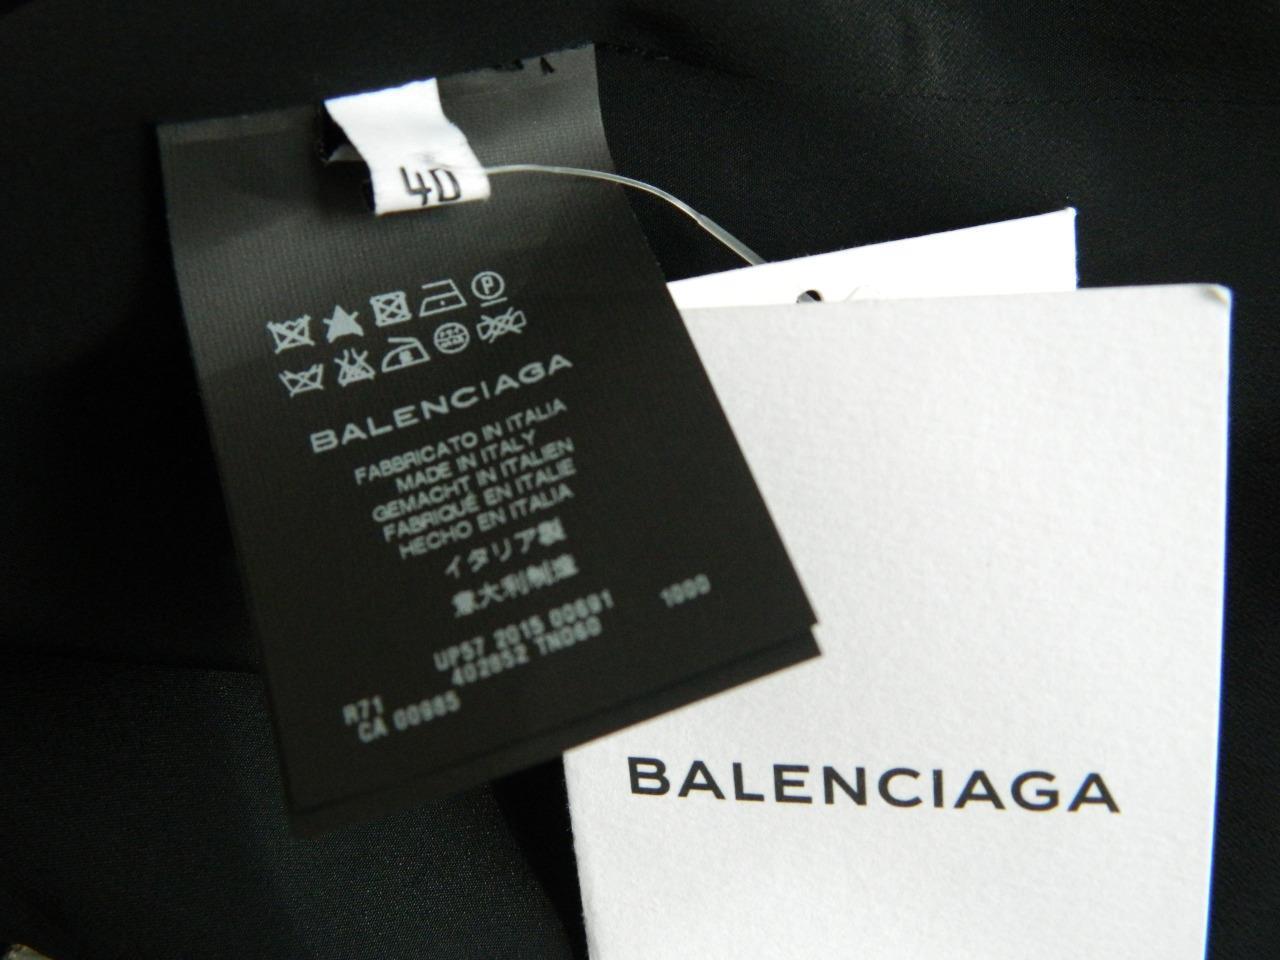 Balenciaga Dress Silver Chain Straps & Detail Black Slip Style NWT $1775 40